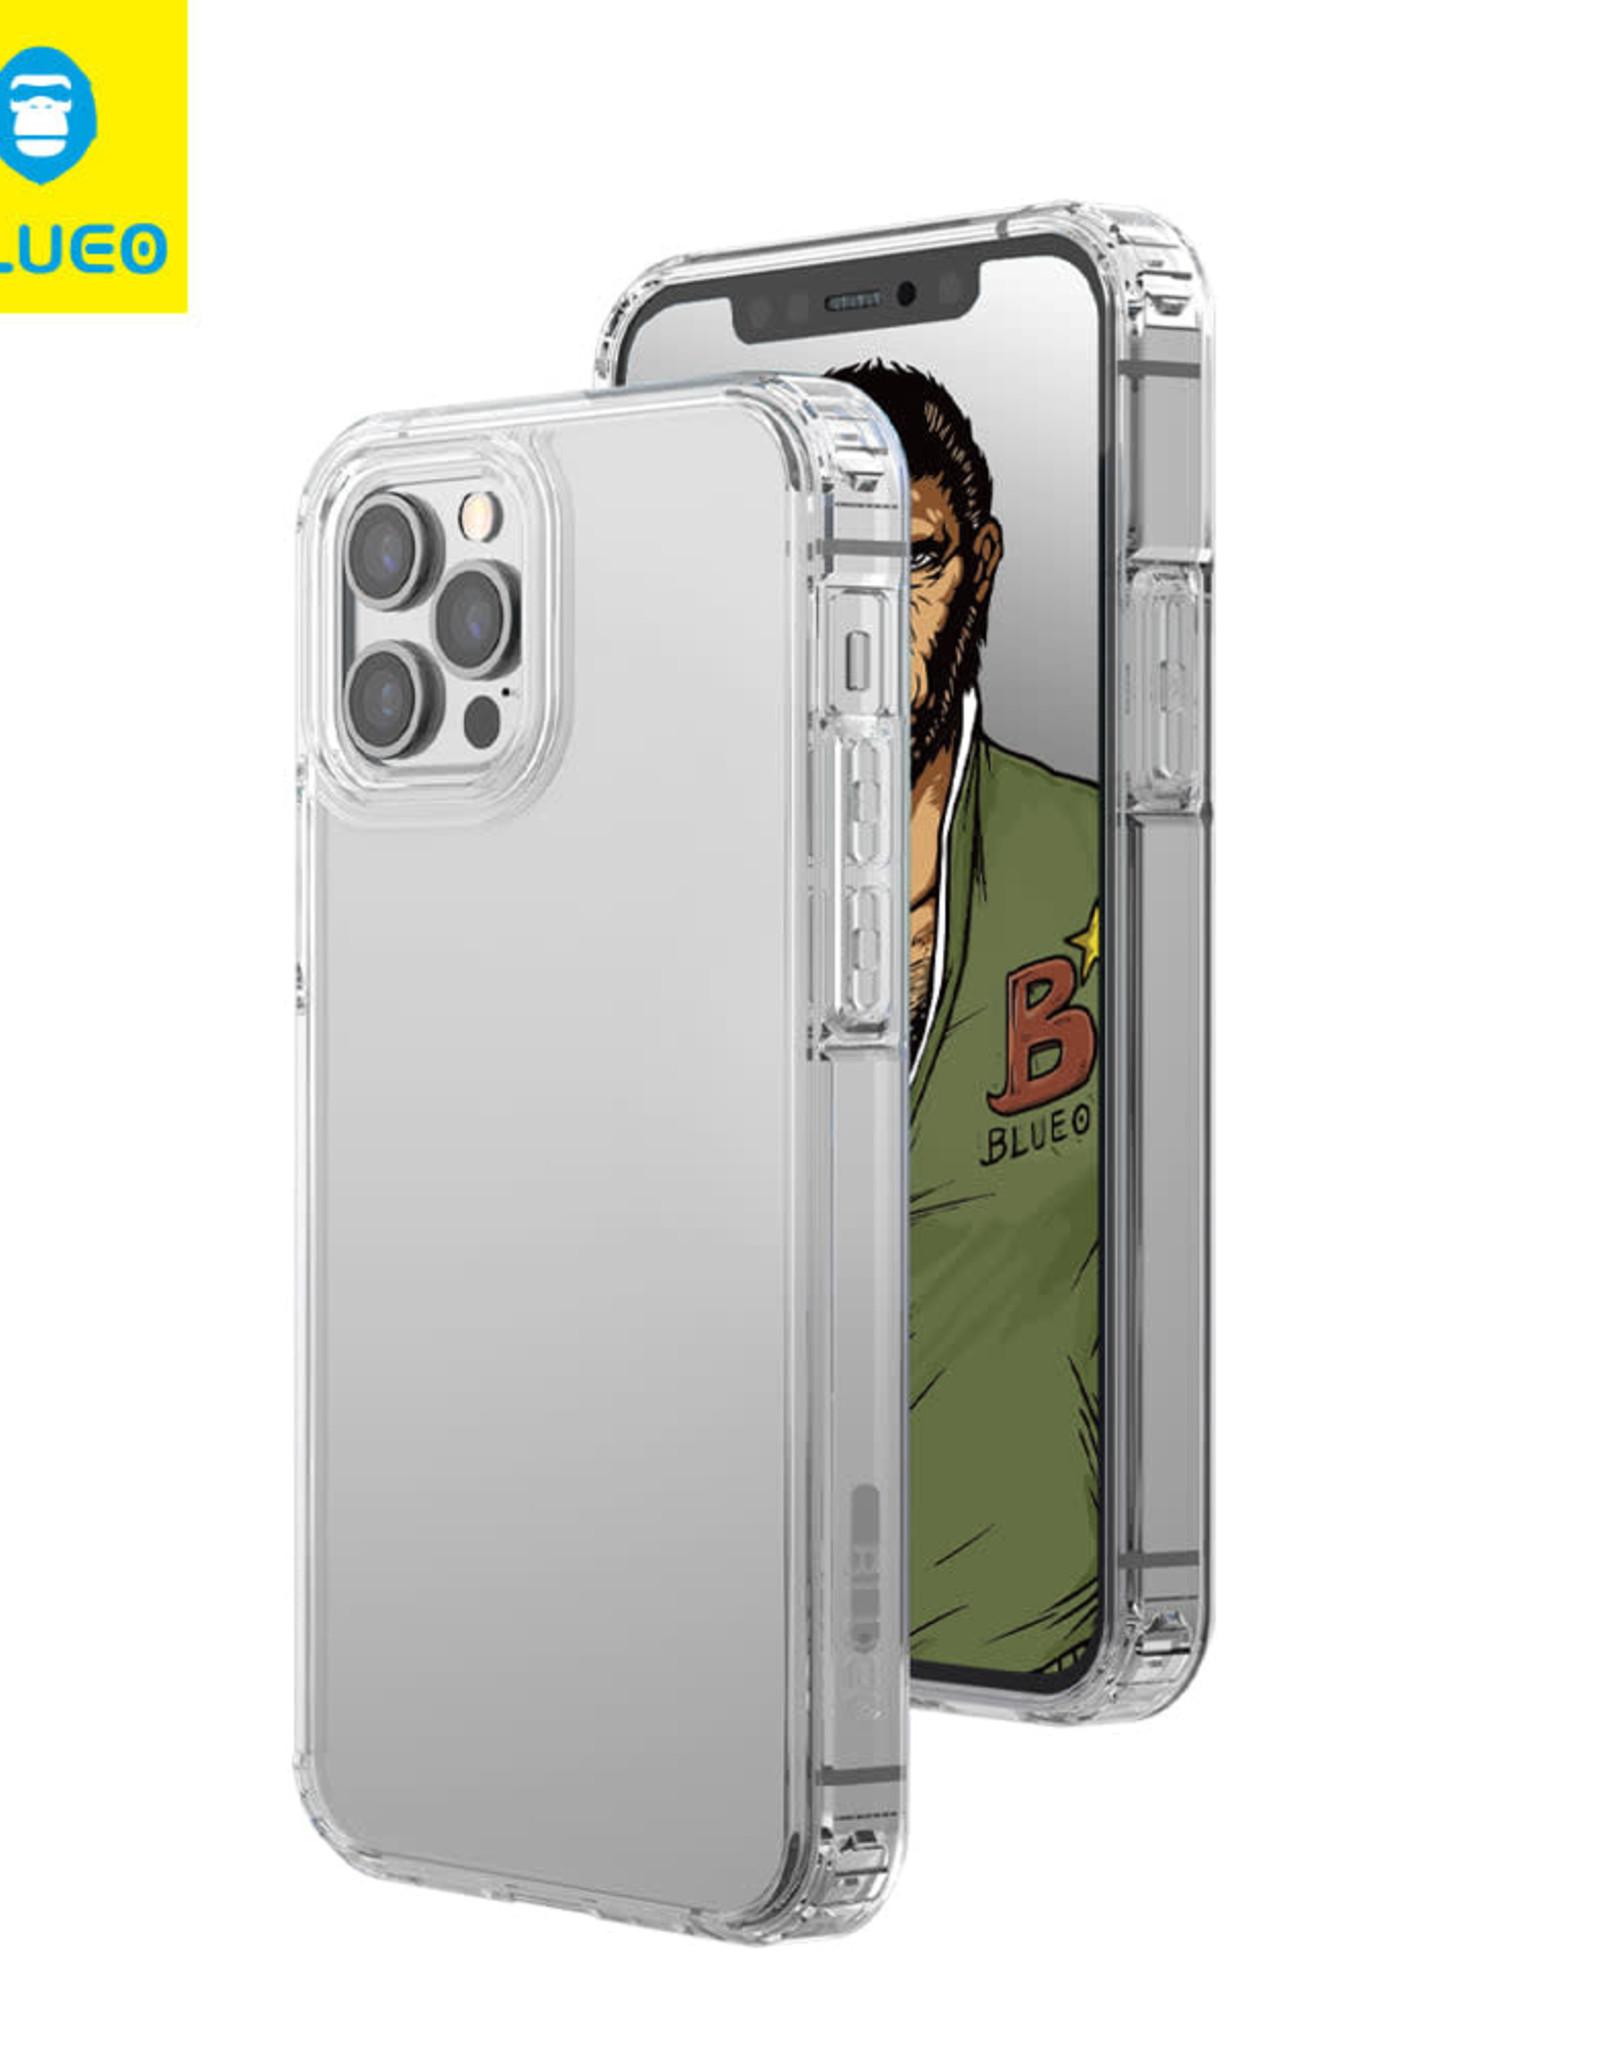 Crystal Drop Resistance Phone Case